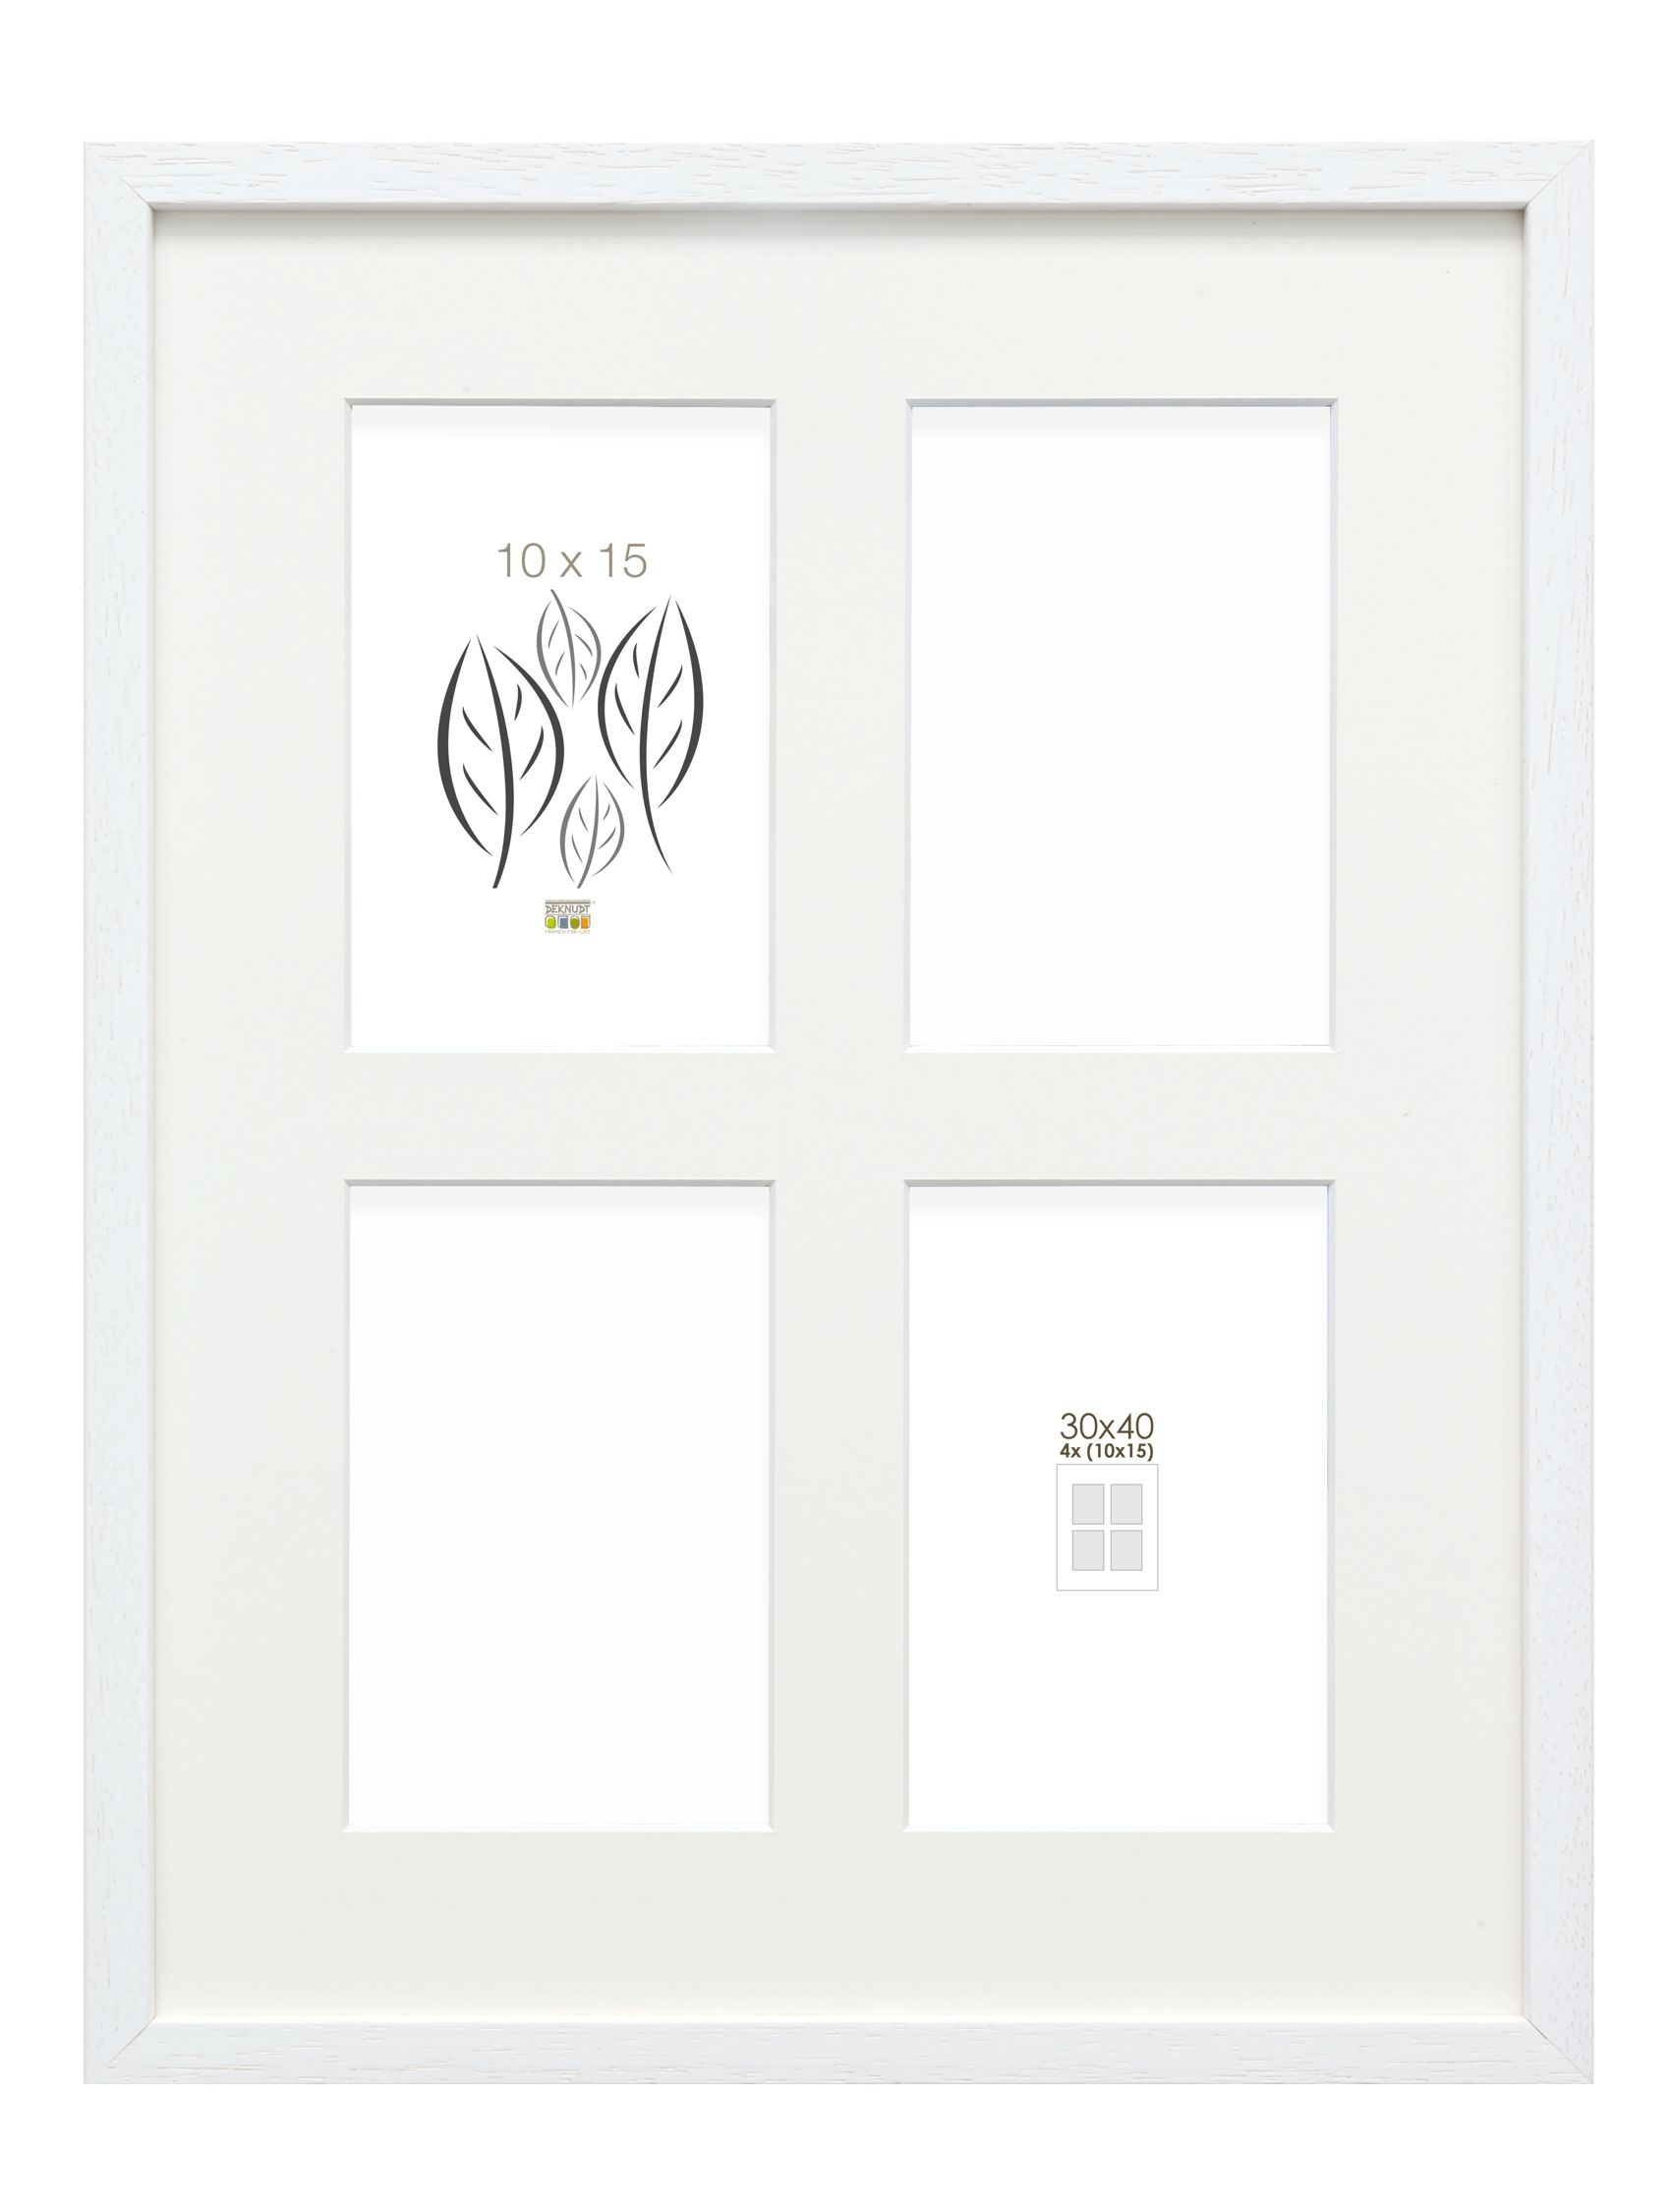 Basic, wit hoog profiel voor 4 foto's 10x15cm, hout (30x40cm) S223K1 P4